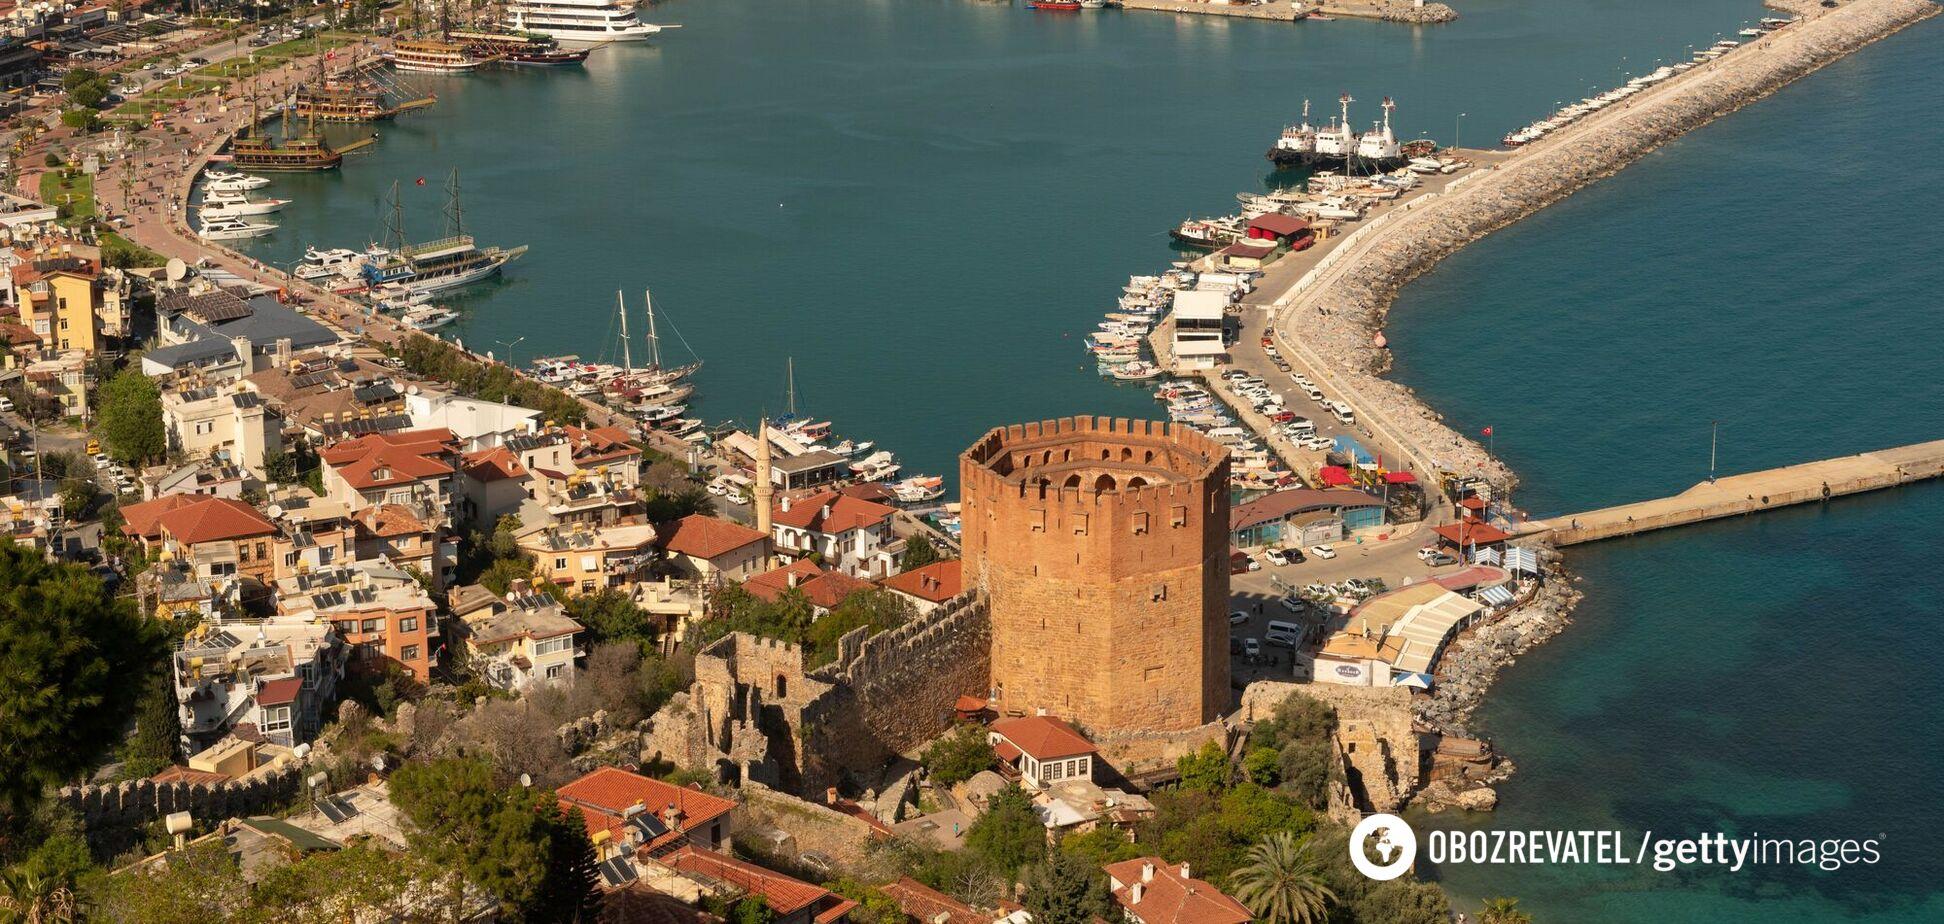 Турция ставит туристический рекорд, – ассоциация турагентств